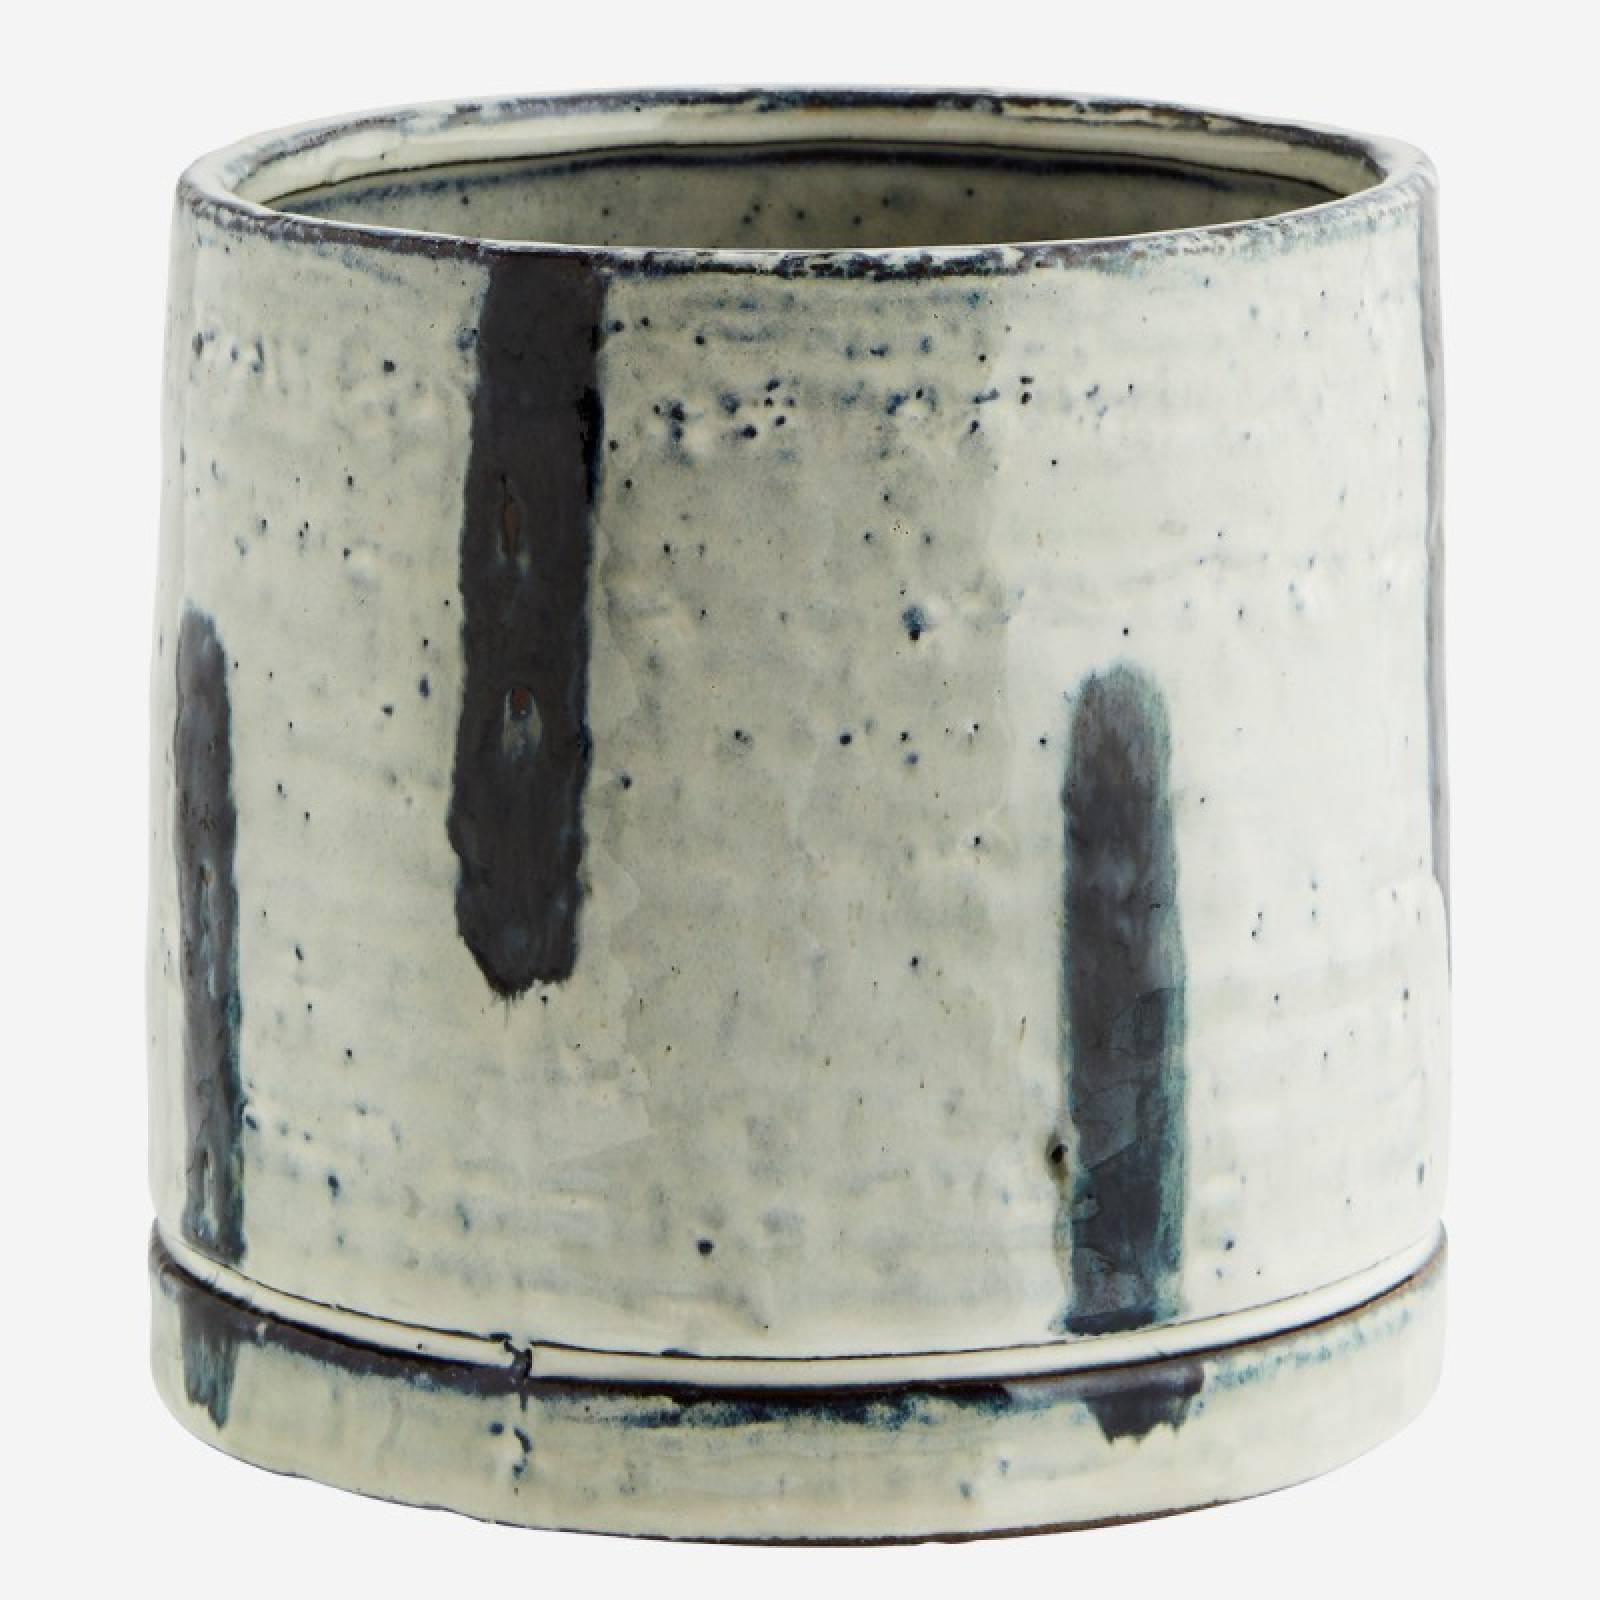 Stoneware Flower Pot Hand Glazed Blue White with Blue Stripes thumbnails